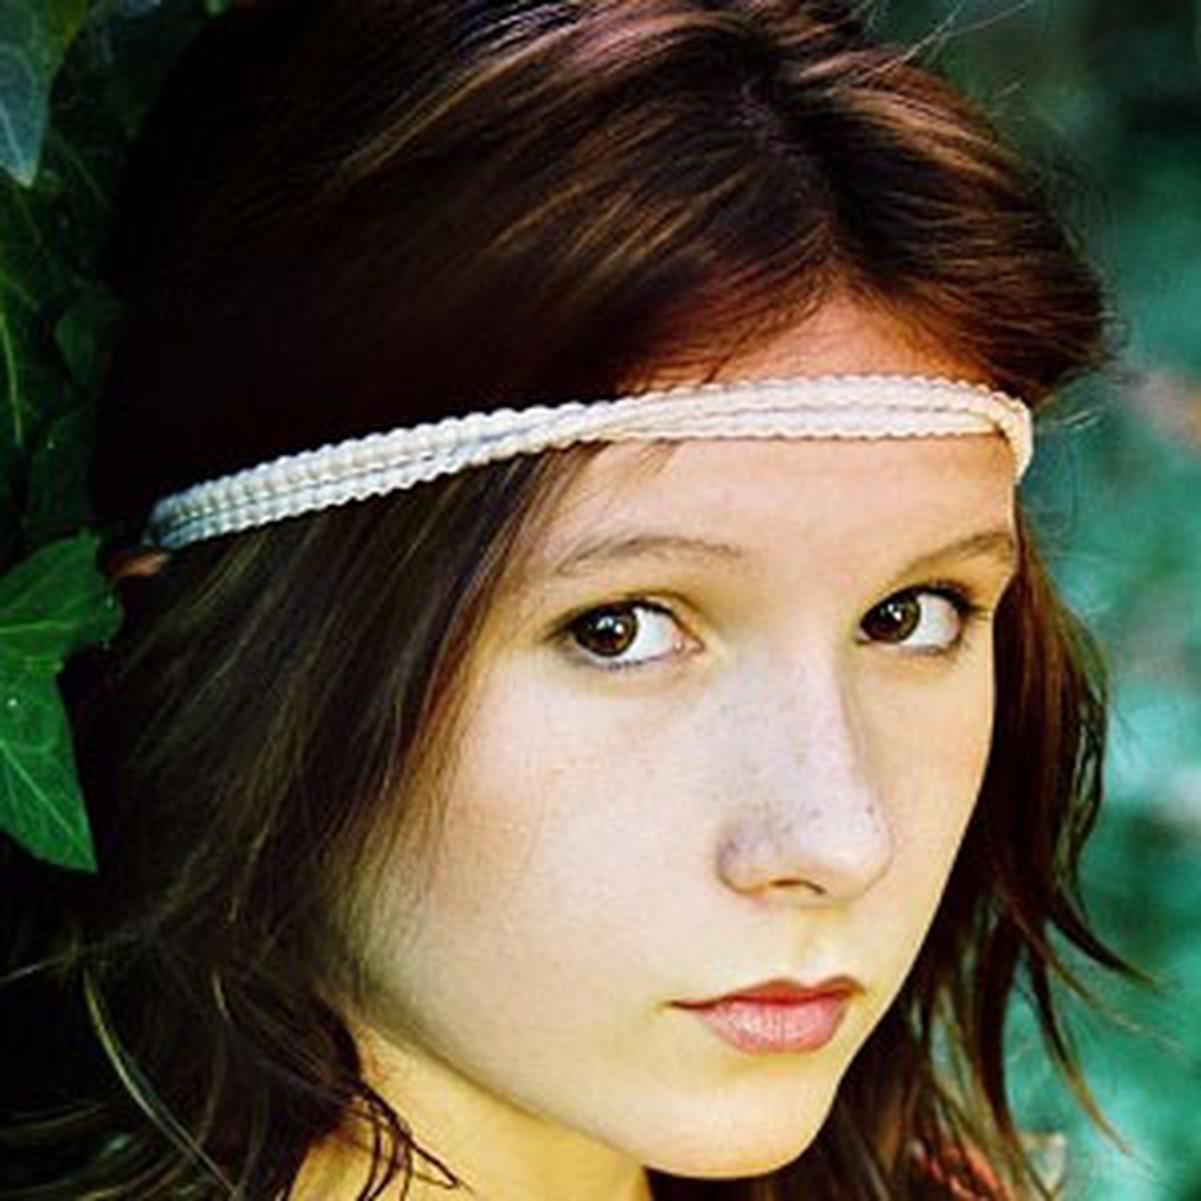 Athena Skye